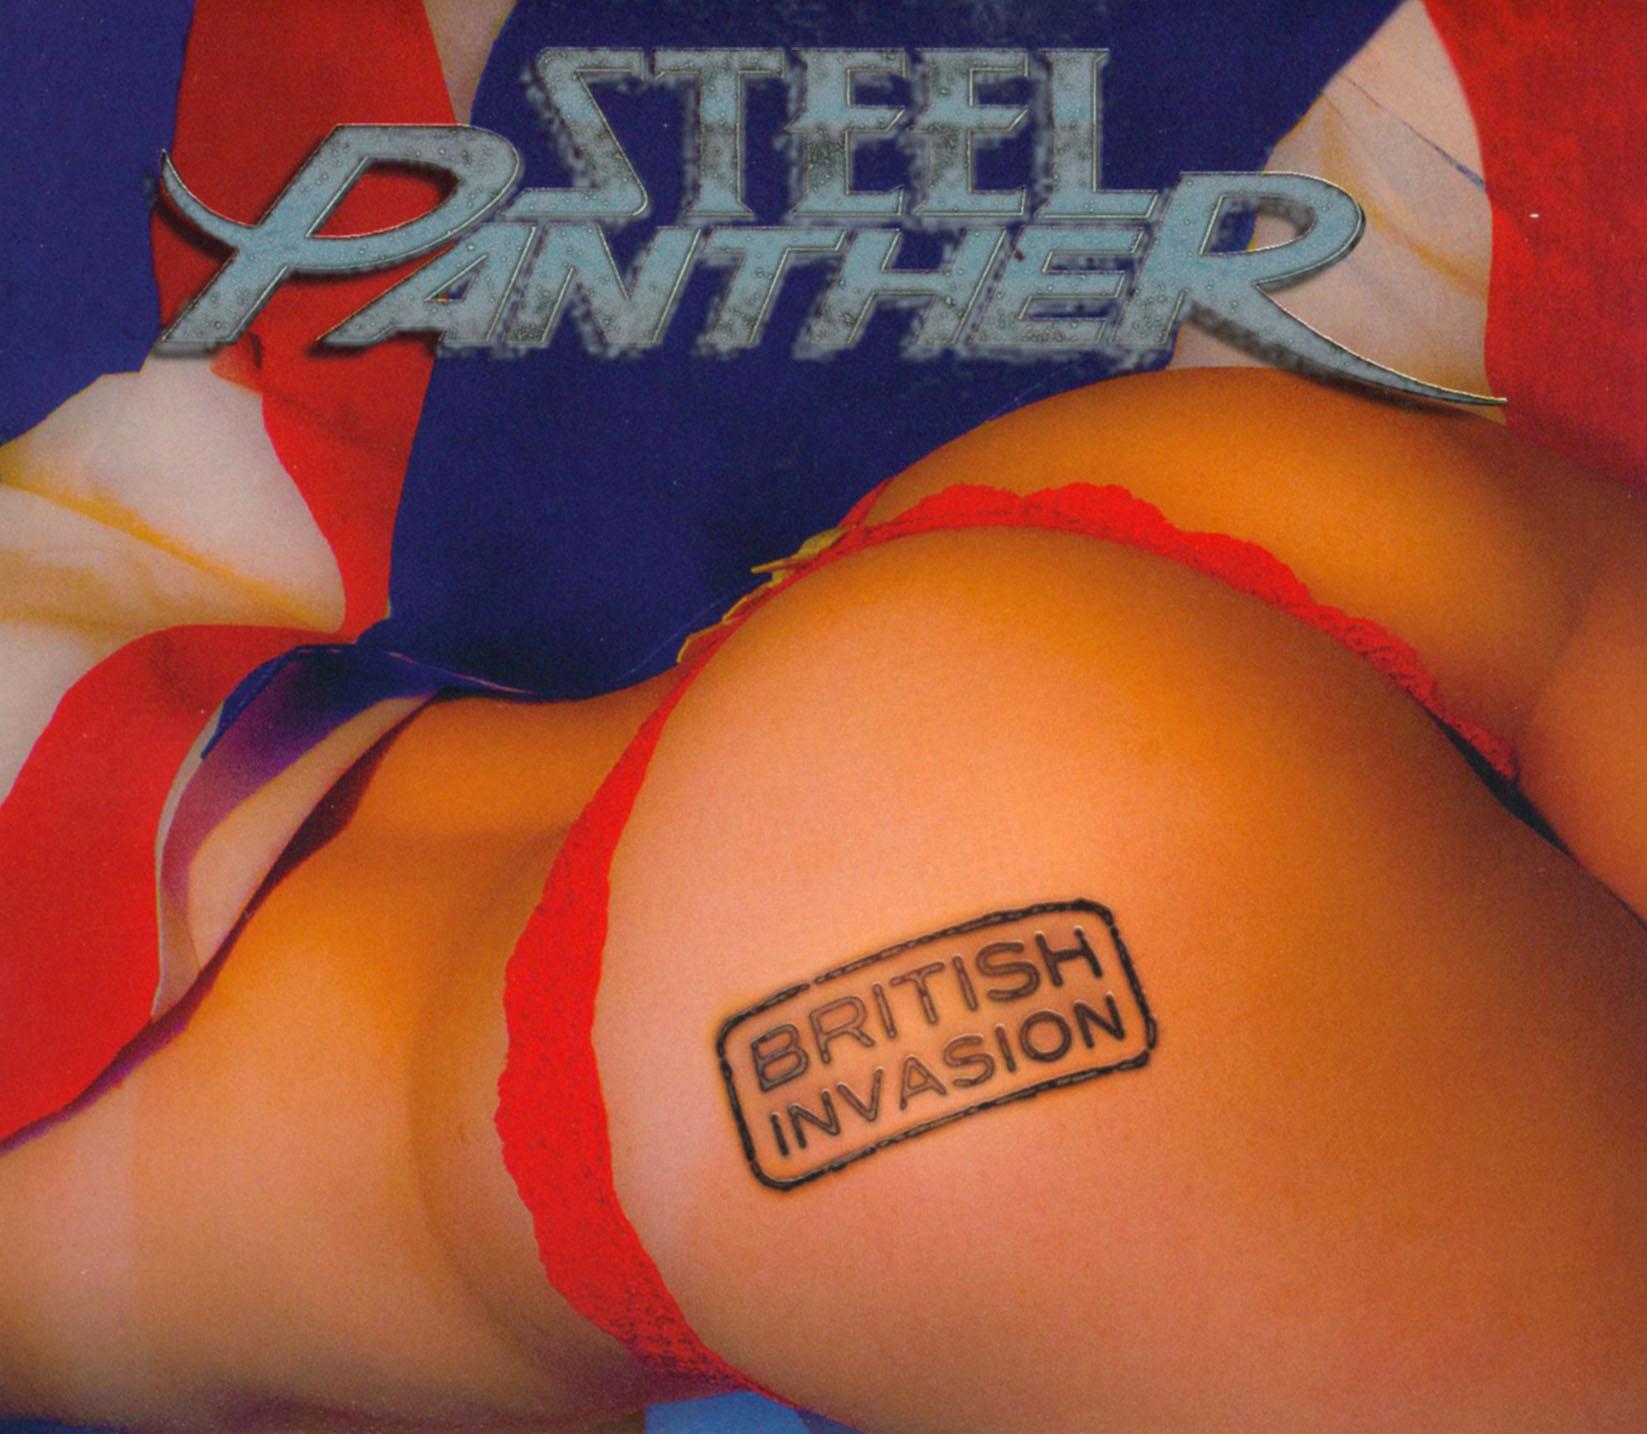 Steel Panther: British Invasion